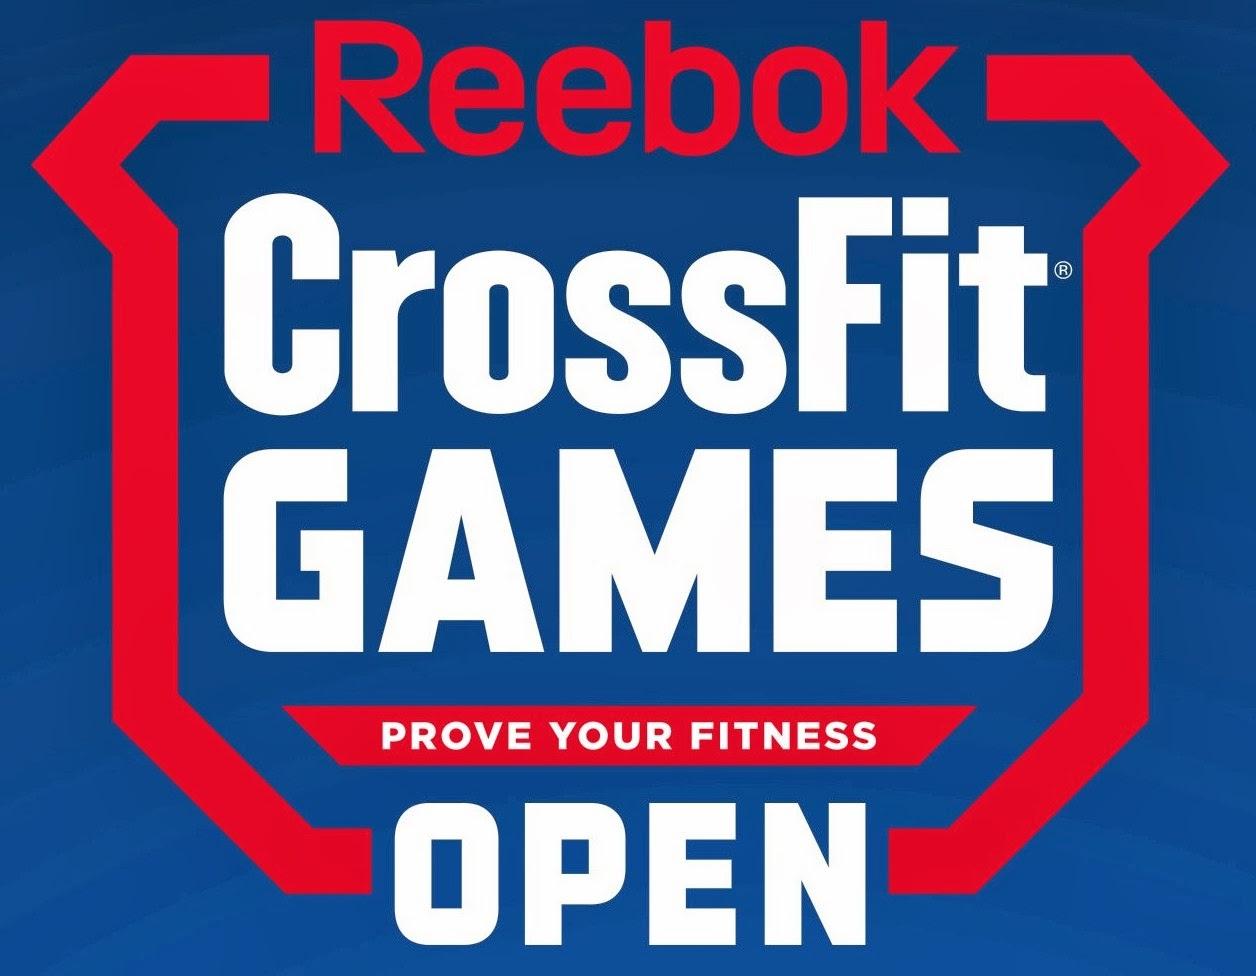 2016-crossfit-games-open-crossfit-open.jpg